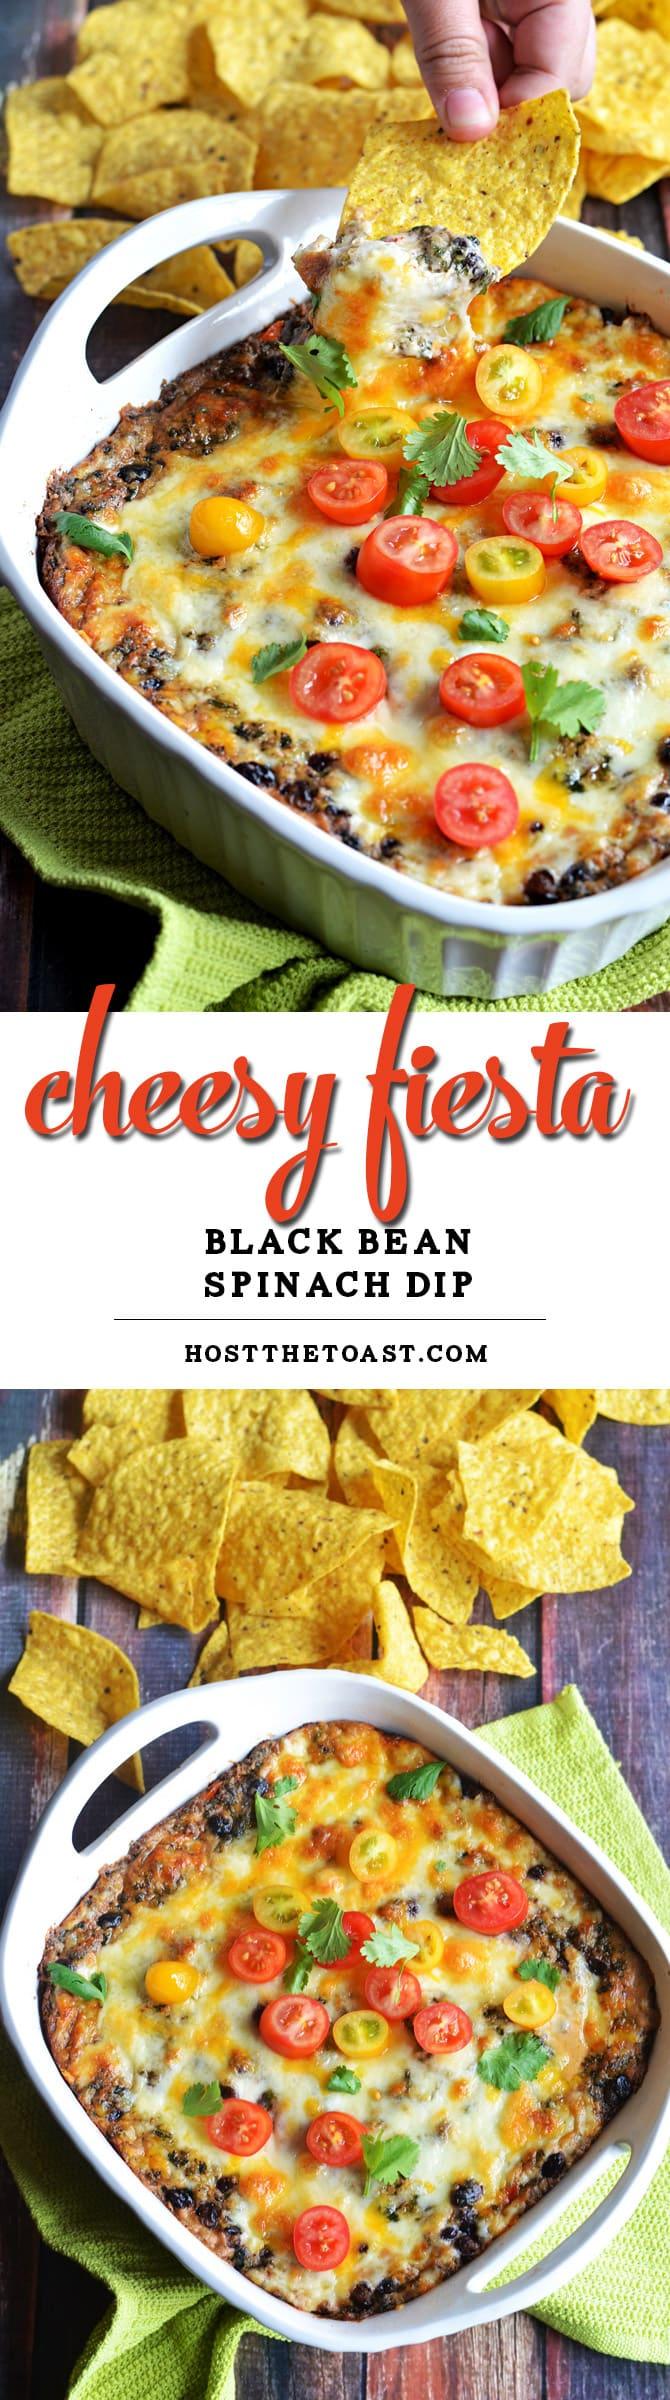 Cheesy Fiesta Black Bean Spinach Dip - Host The Toast